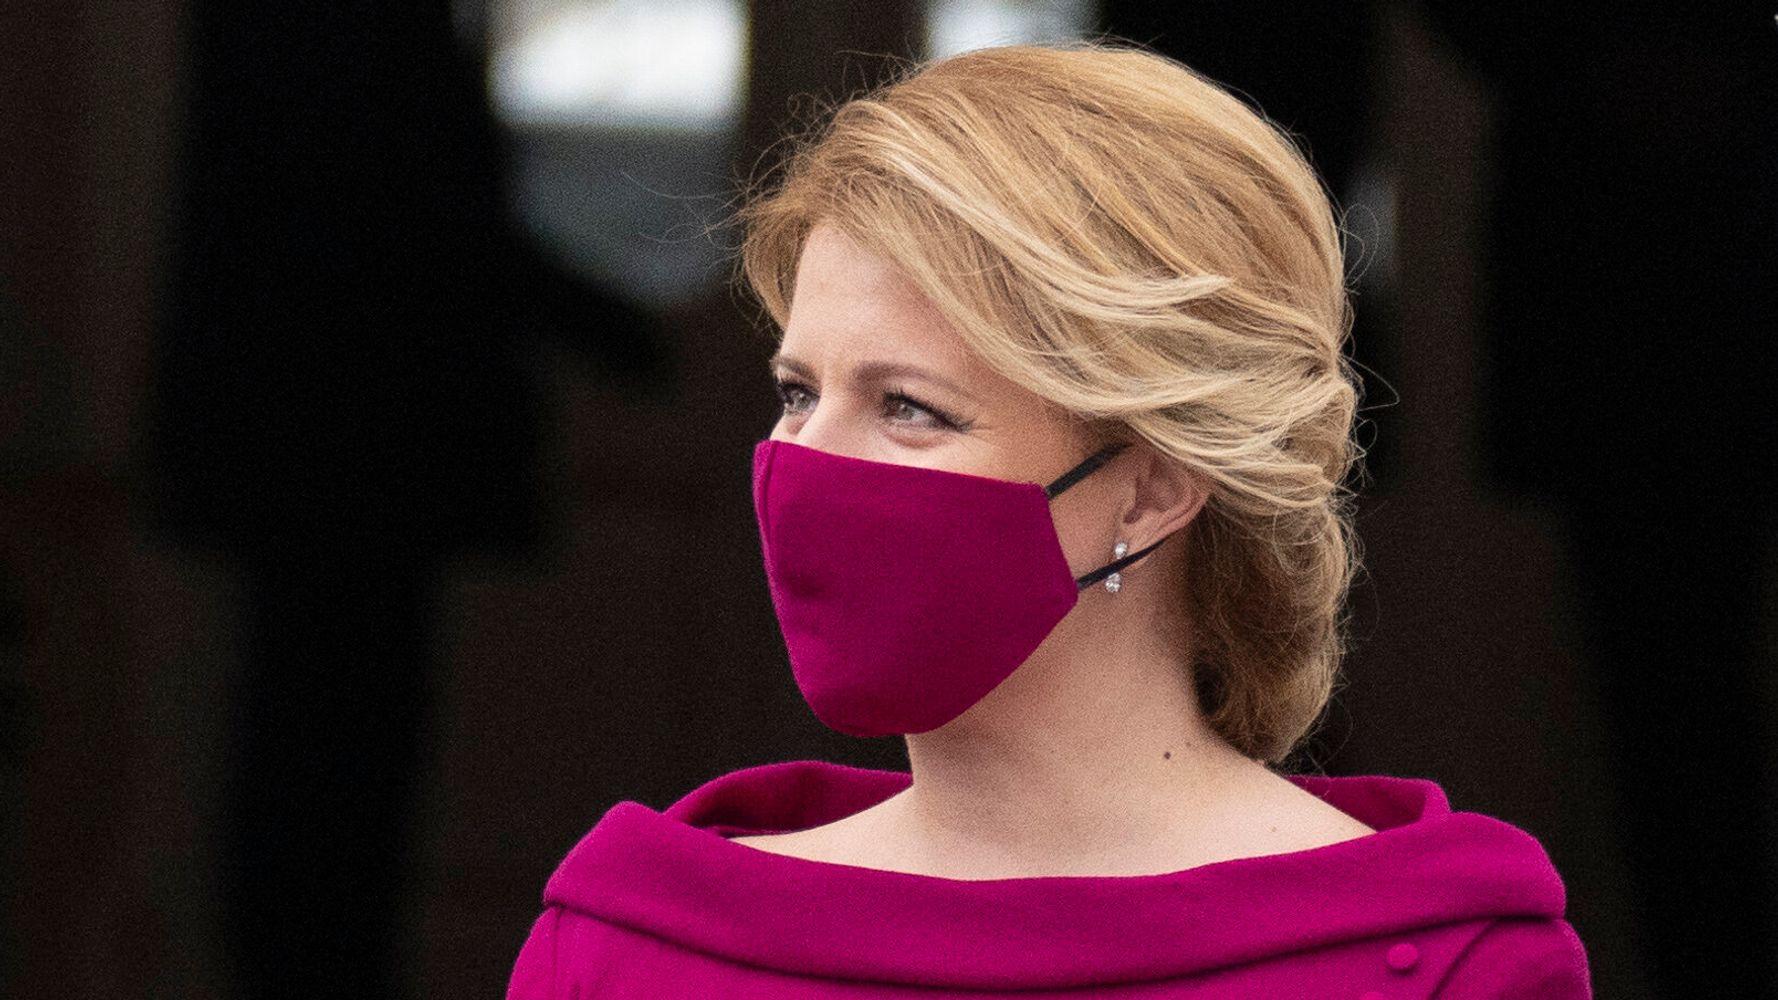 The President Of Slovakia Has Uh Nailed Her Coronavirus Look